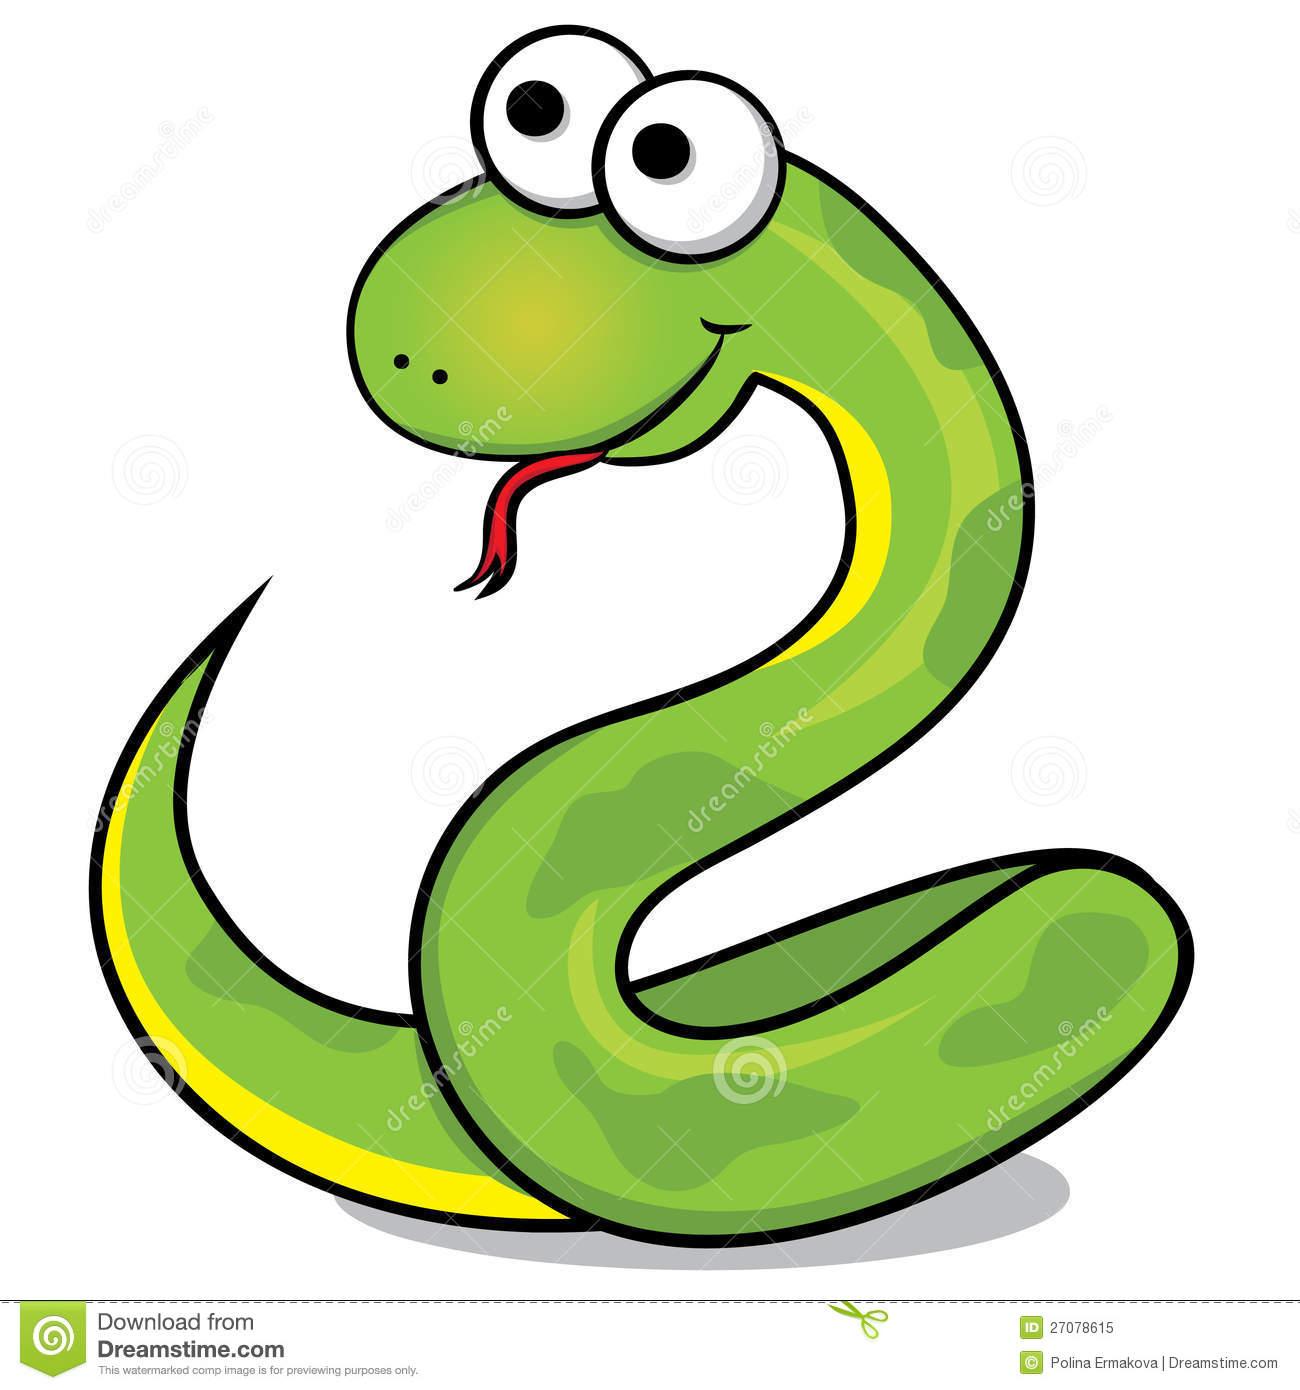 Anaconda clipart #11, Download drawings